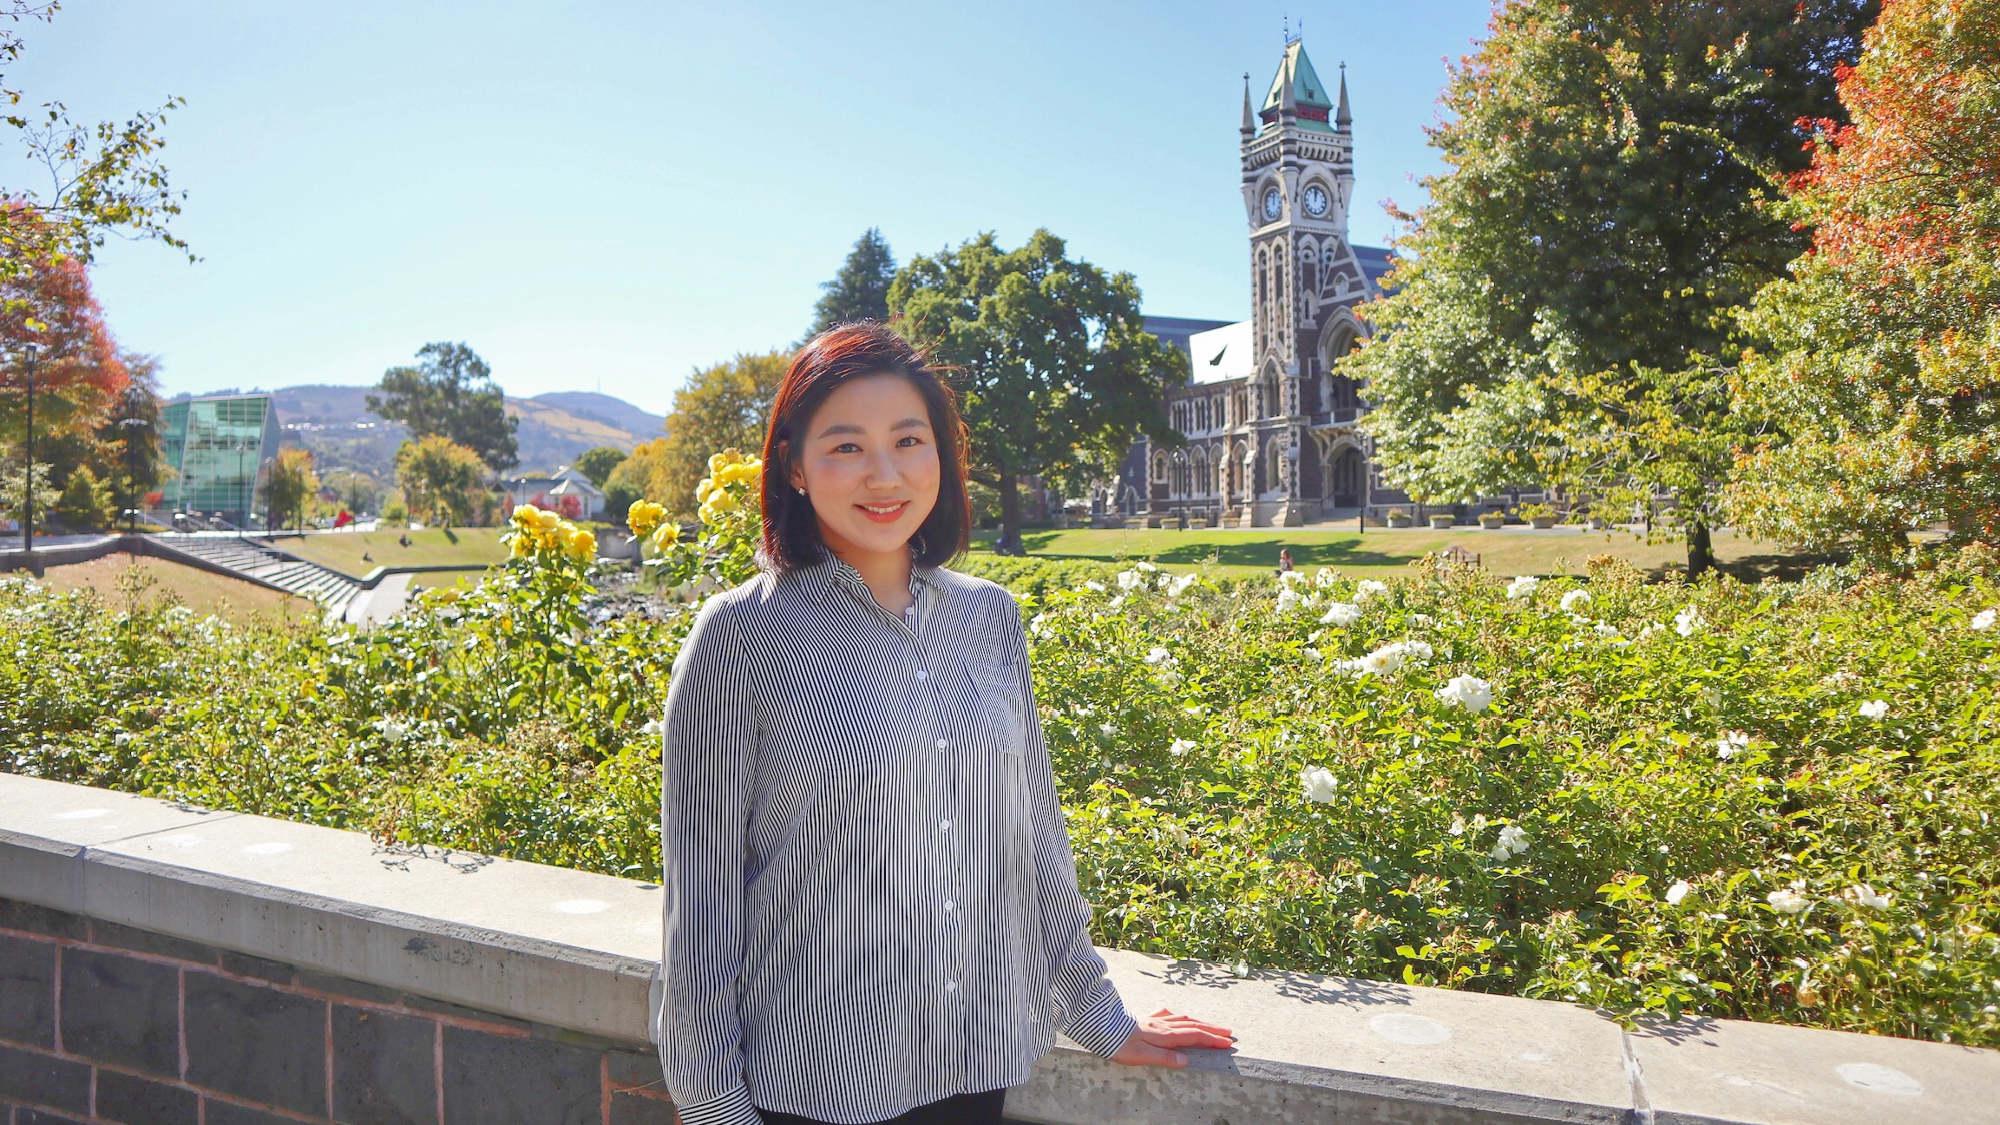 Women in dentistry: Meet dental technician and researcher Dr Joanne Choi